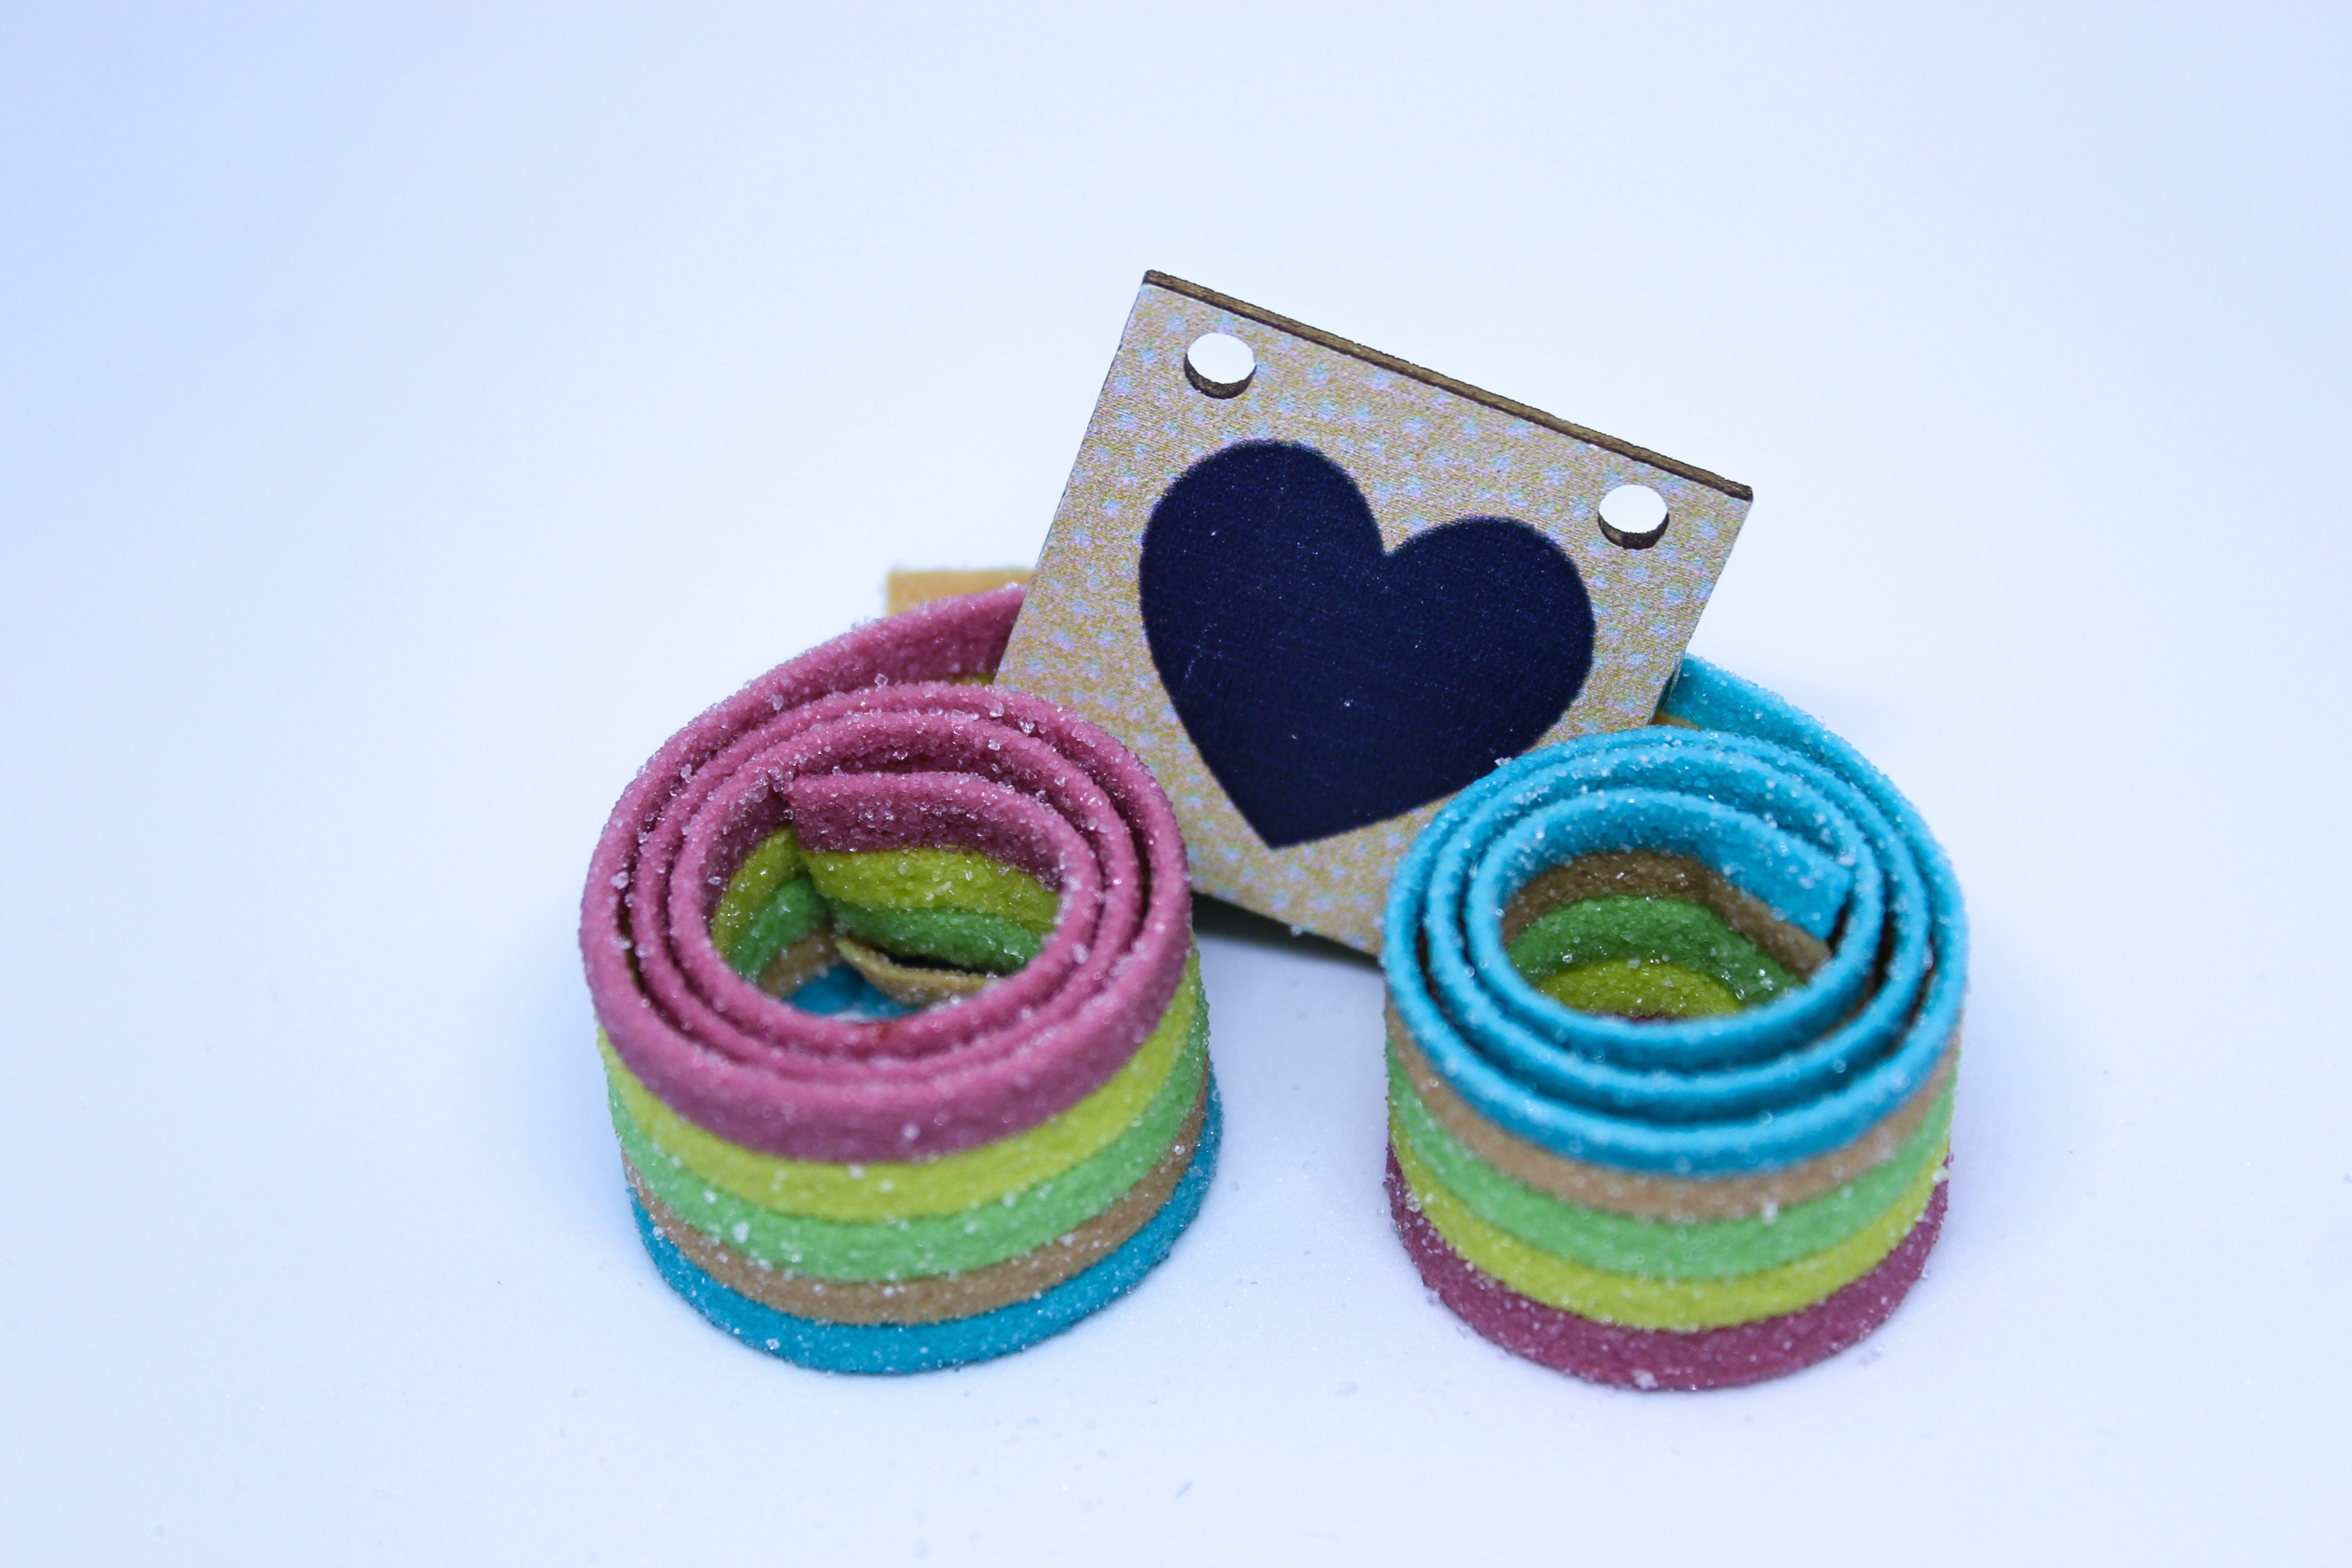 Free stock photo of #LGBTQIA#hearts, #lollies